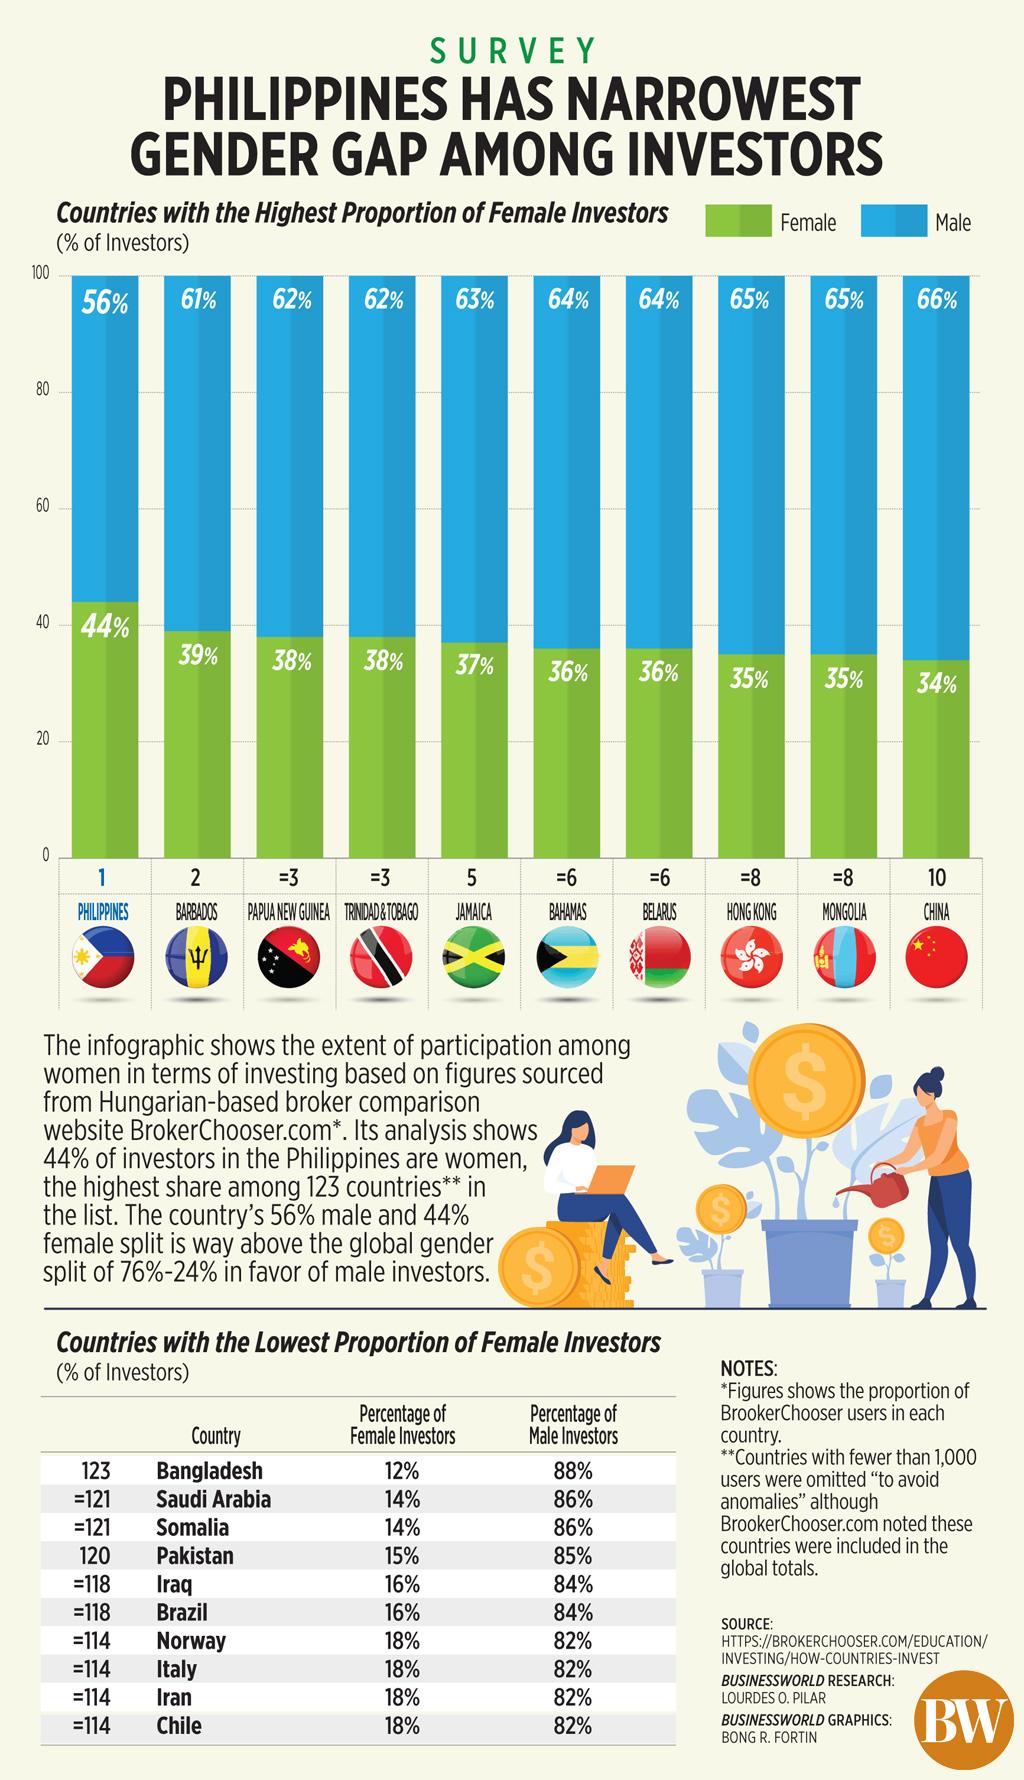 Philippines has narrowest gender gap among investors